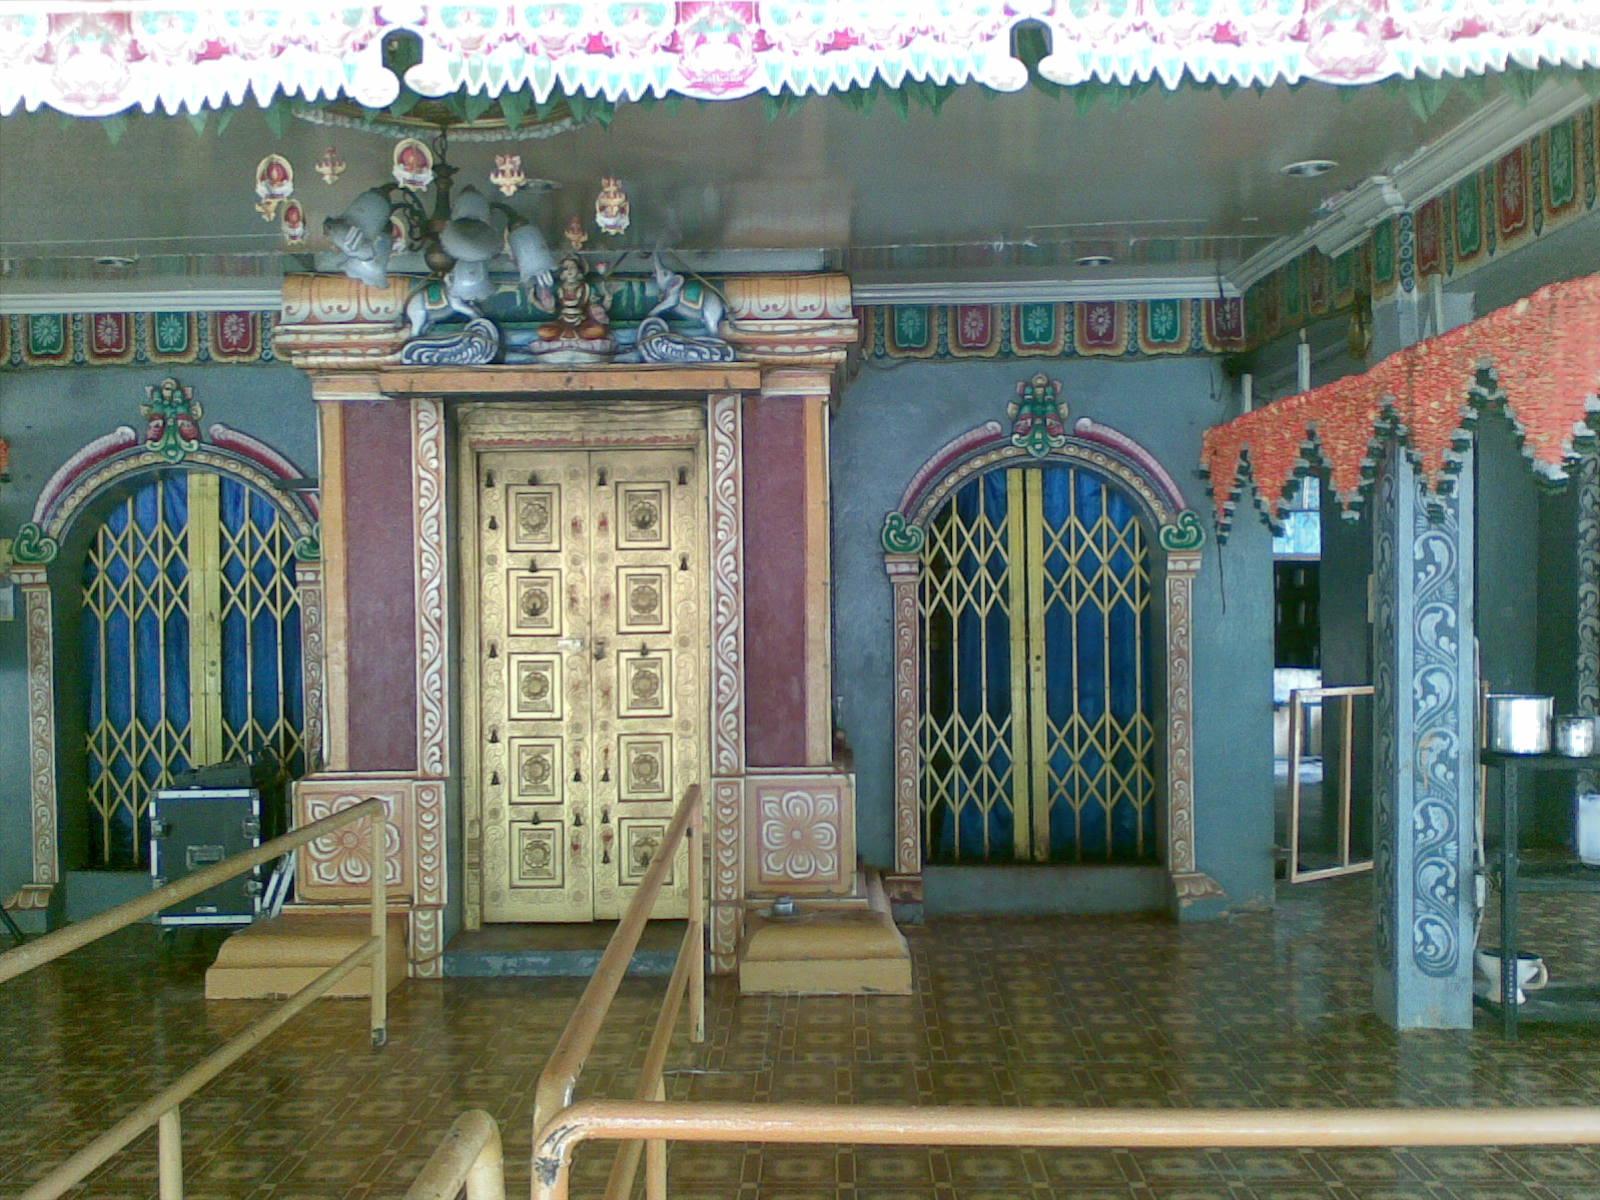 Kuil Arulmigu Sri Melmalayanur Angala Parameswari Amman